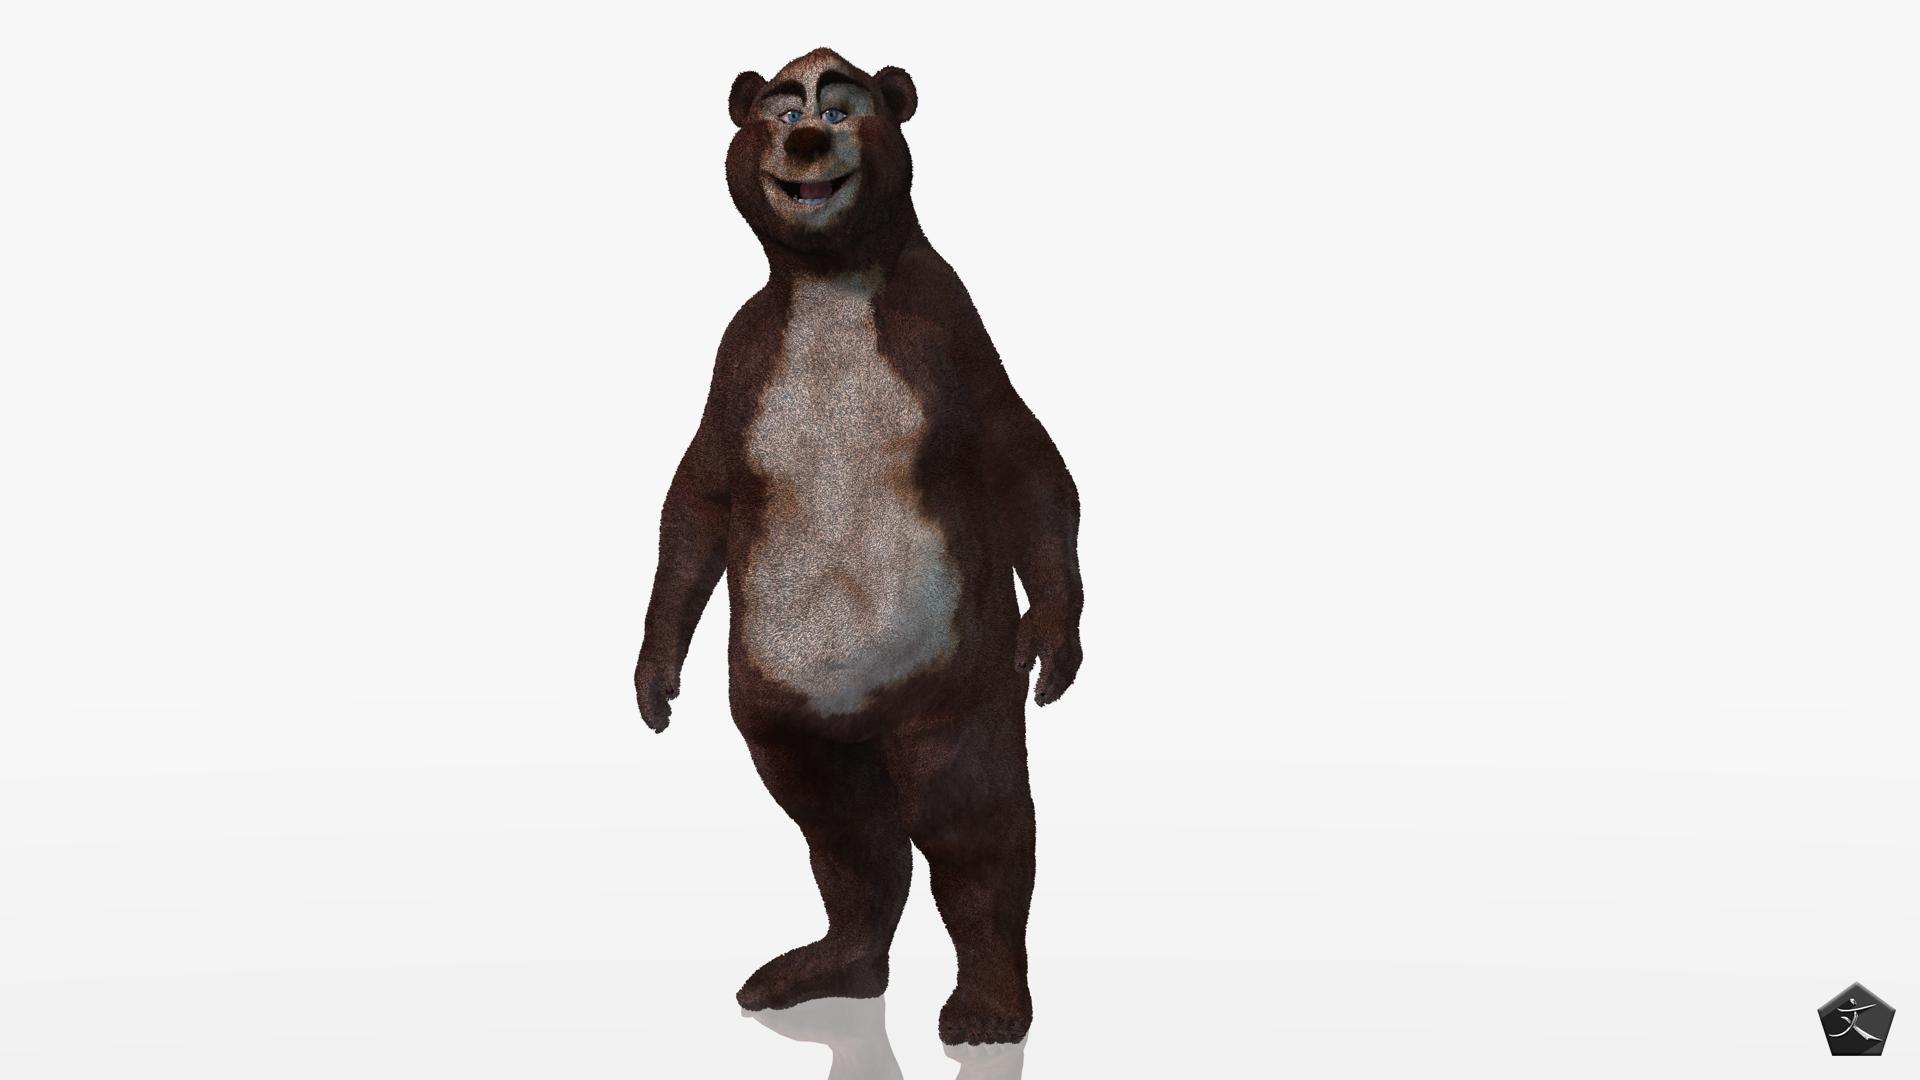 https://dl.dropboxusercontent.com/s/cpj5js7iui73hpf/tokomo_cc_bear_01.png?dl=0